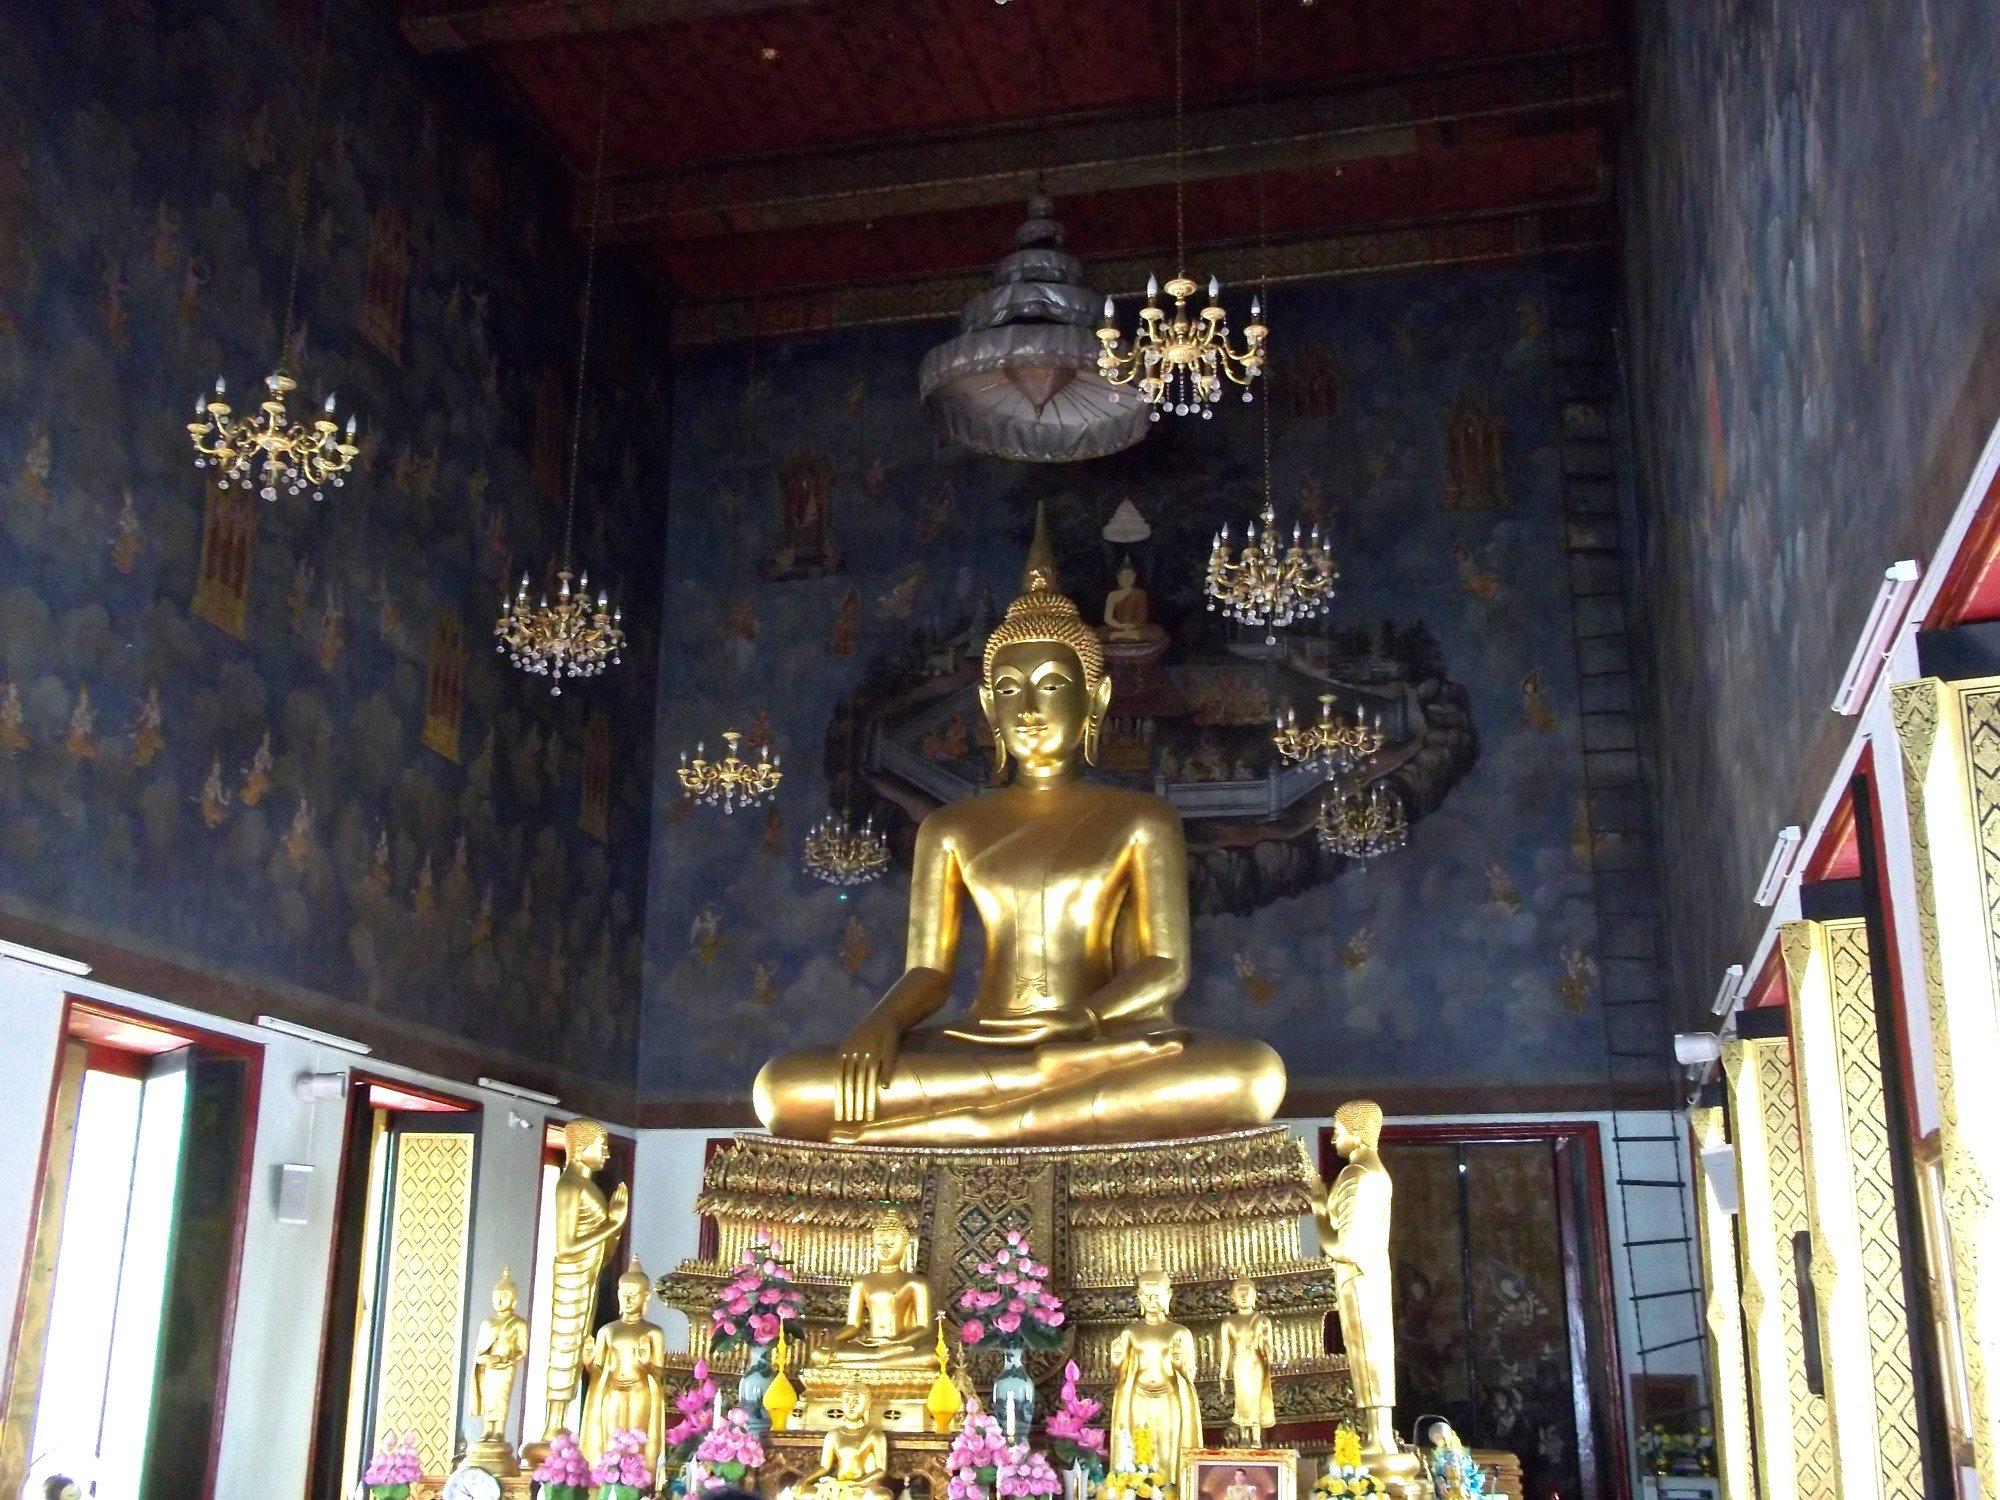 Inside the Ordination Hall at Wat Ratchanatda